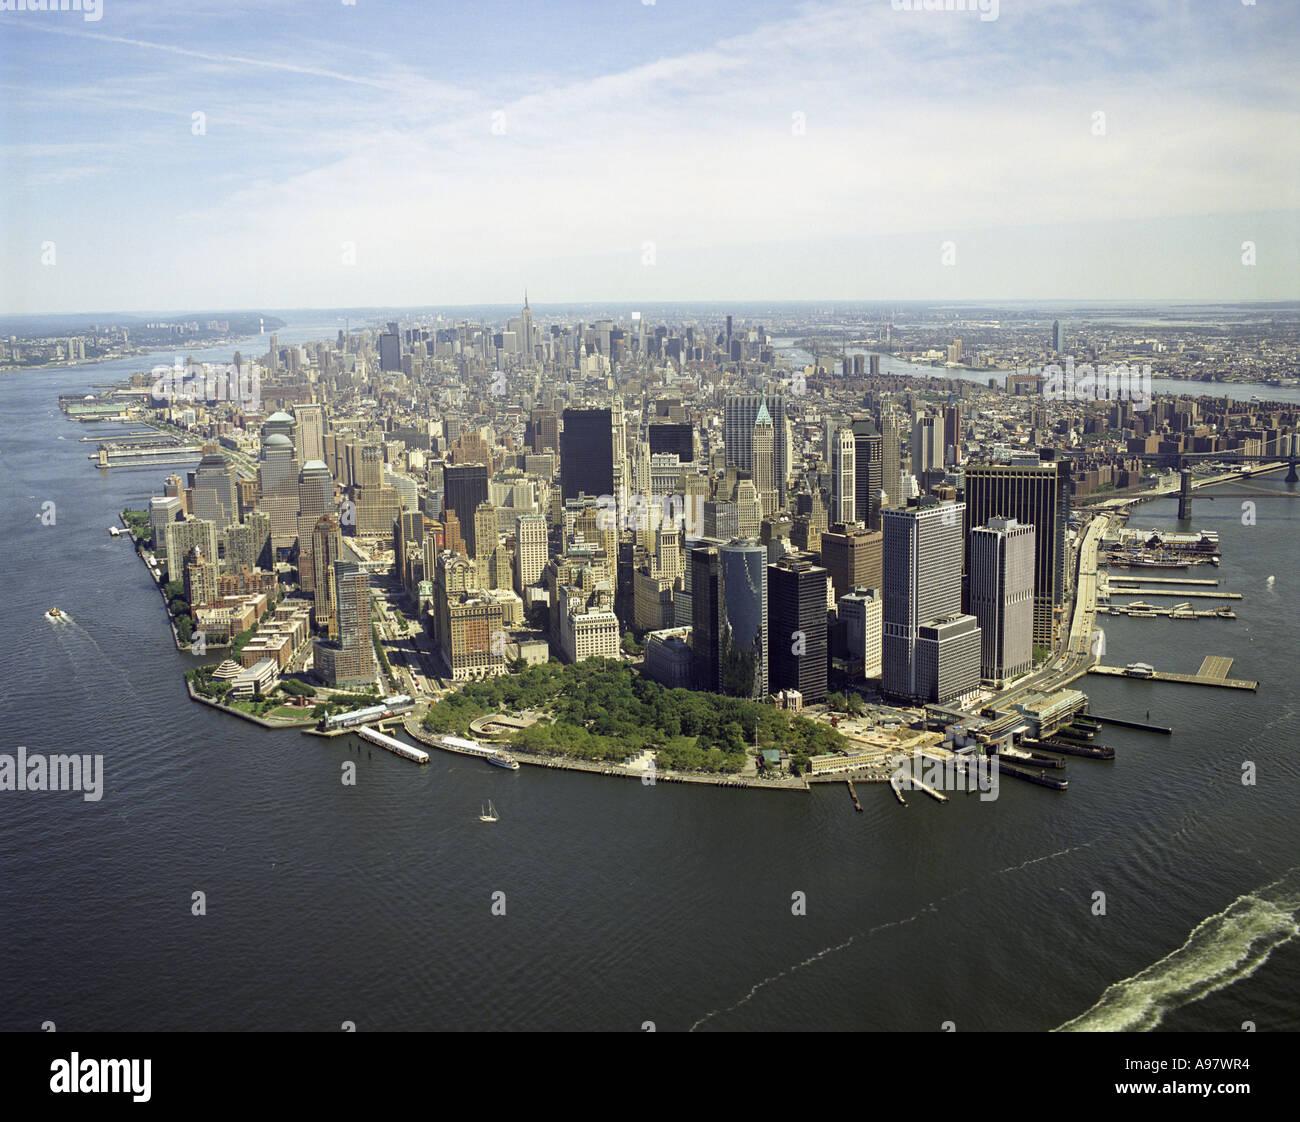 Manhatten New York: Aerial View Of Lower Manhattan, New York City, U.S.A